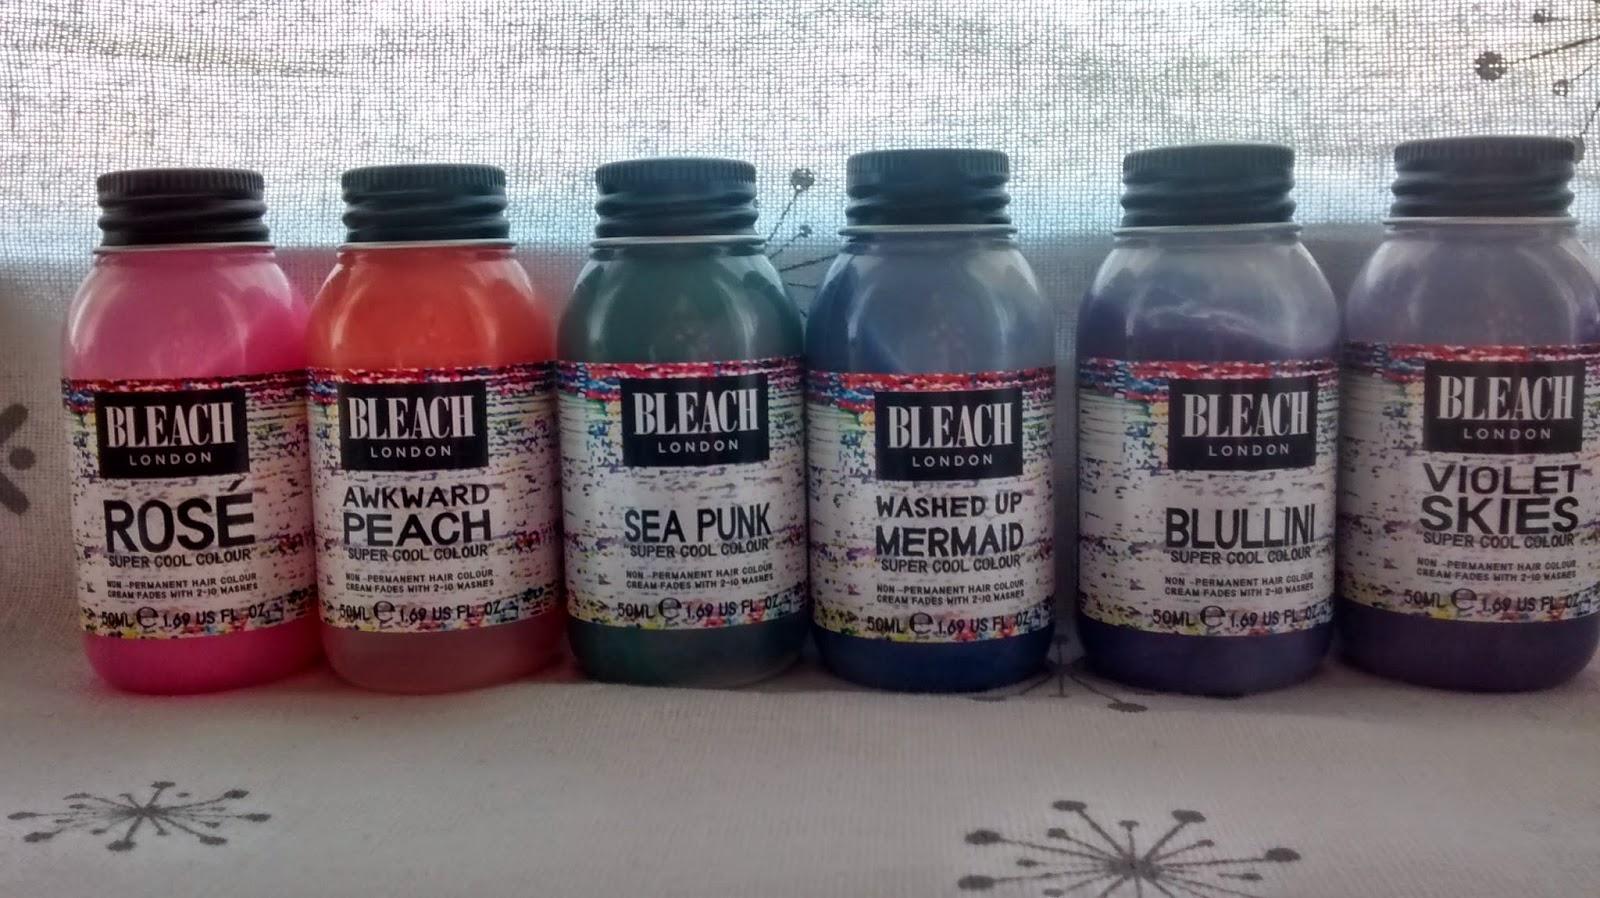 Bleach London Spin The Bleach Bottle Bethemilydann